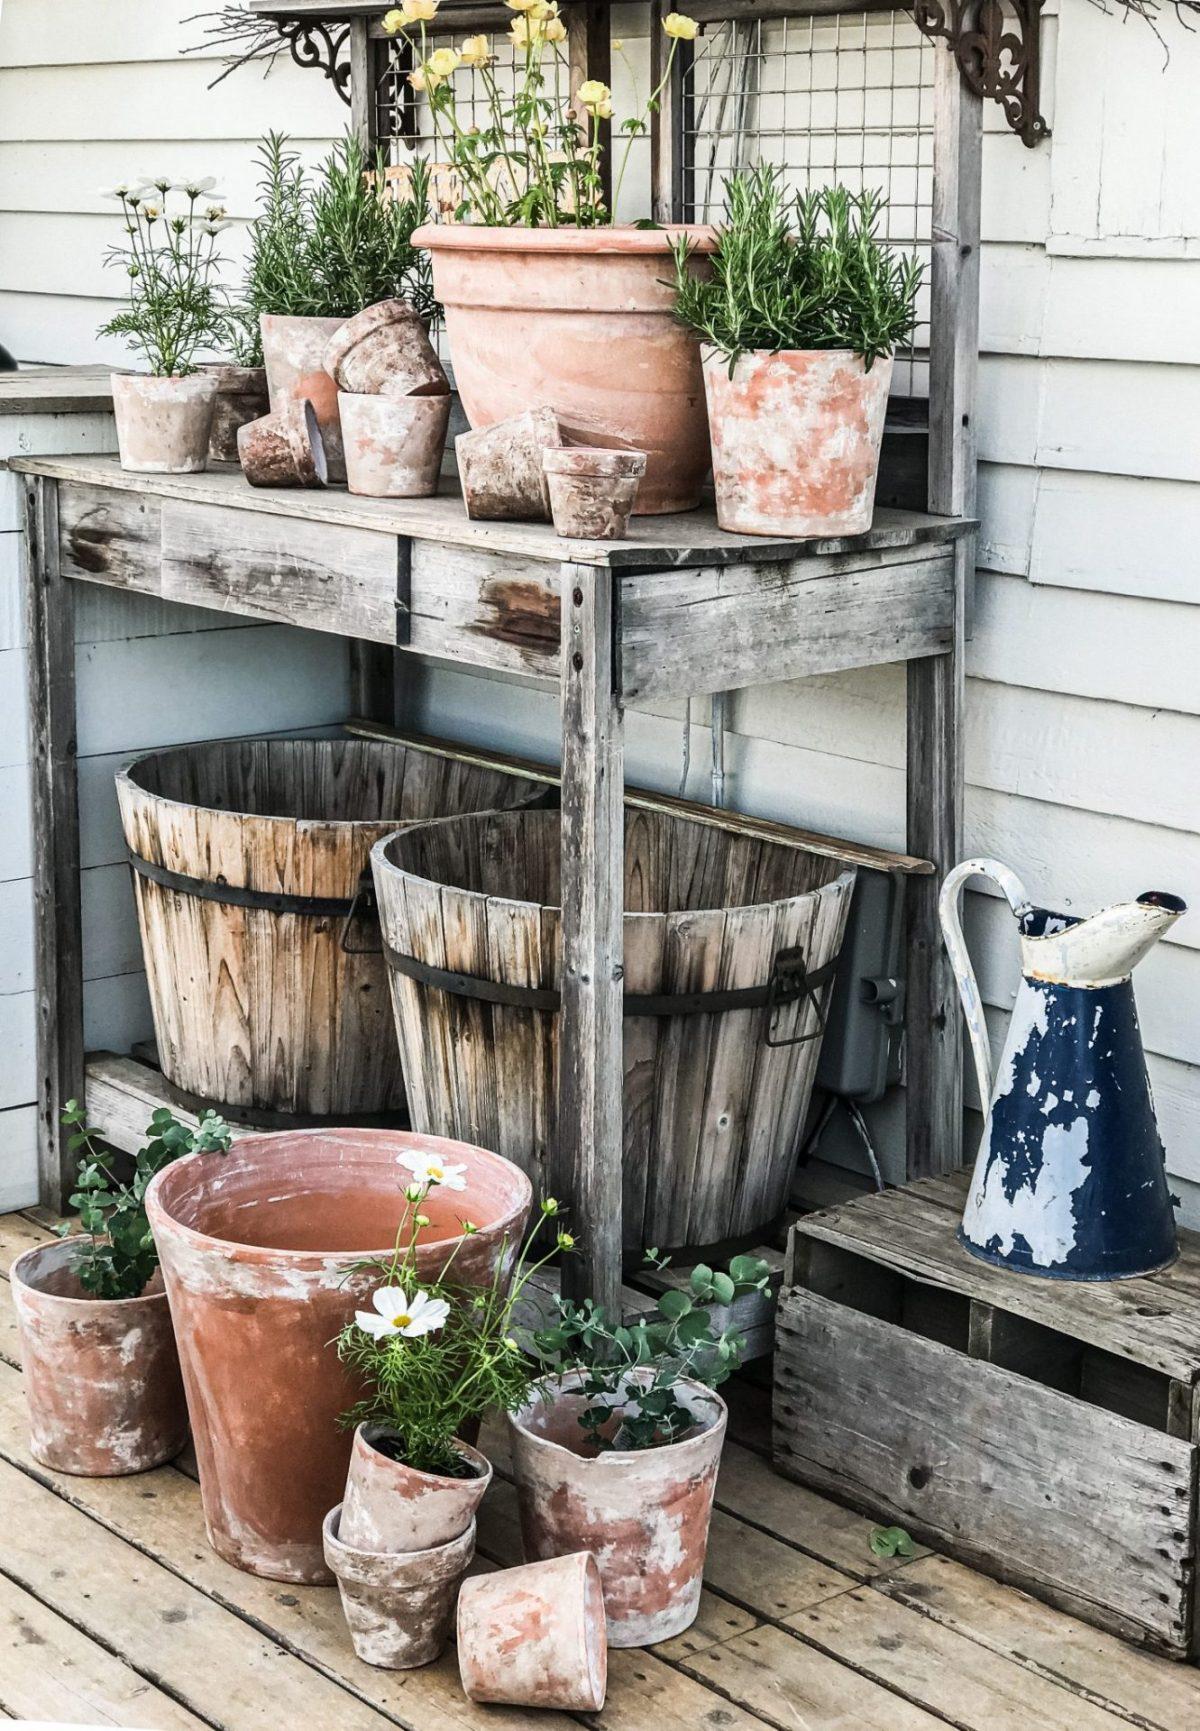 Deb's diy aged terra cotta flower pots on her potting bench